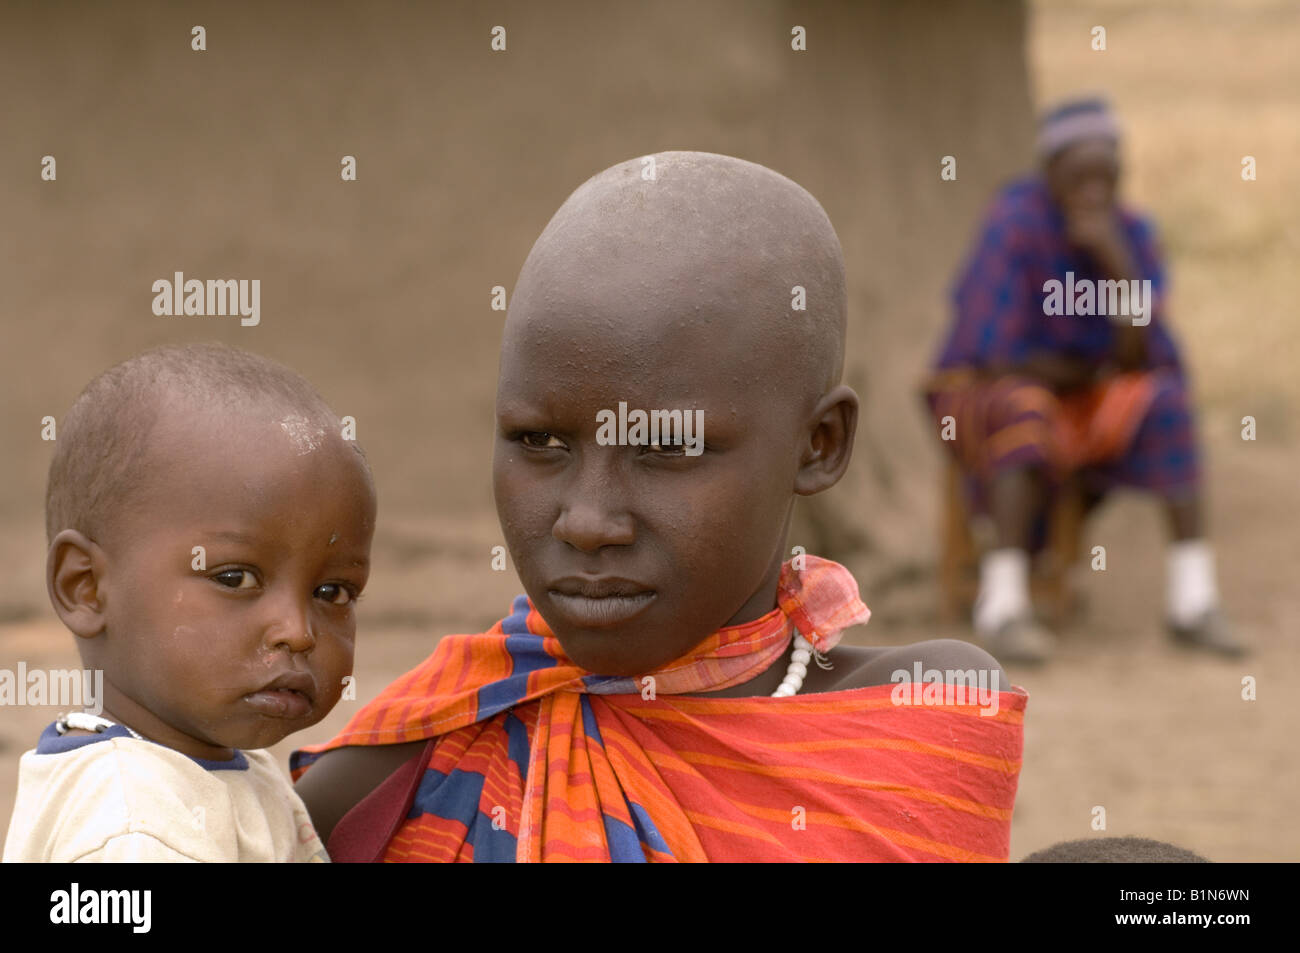 Maasai girl carrying her little sibling, Tanzania - Stock Image